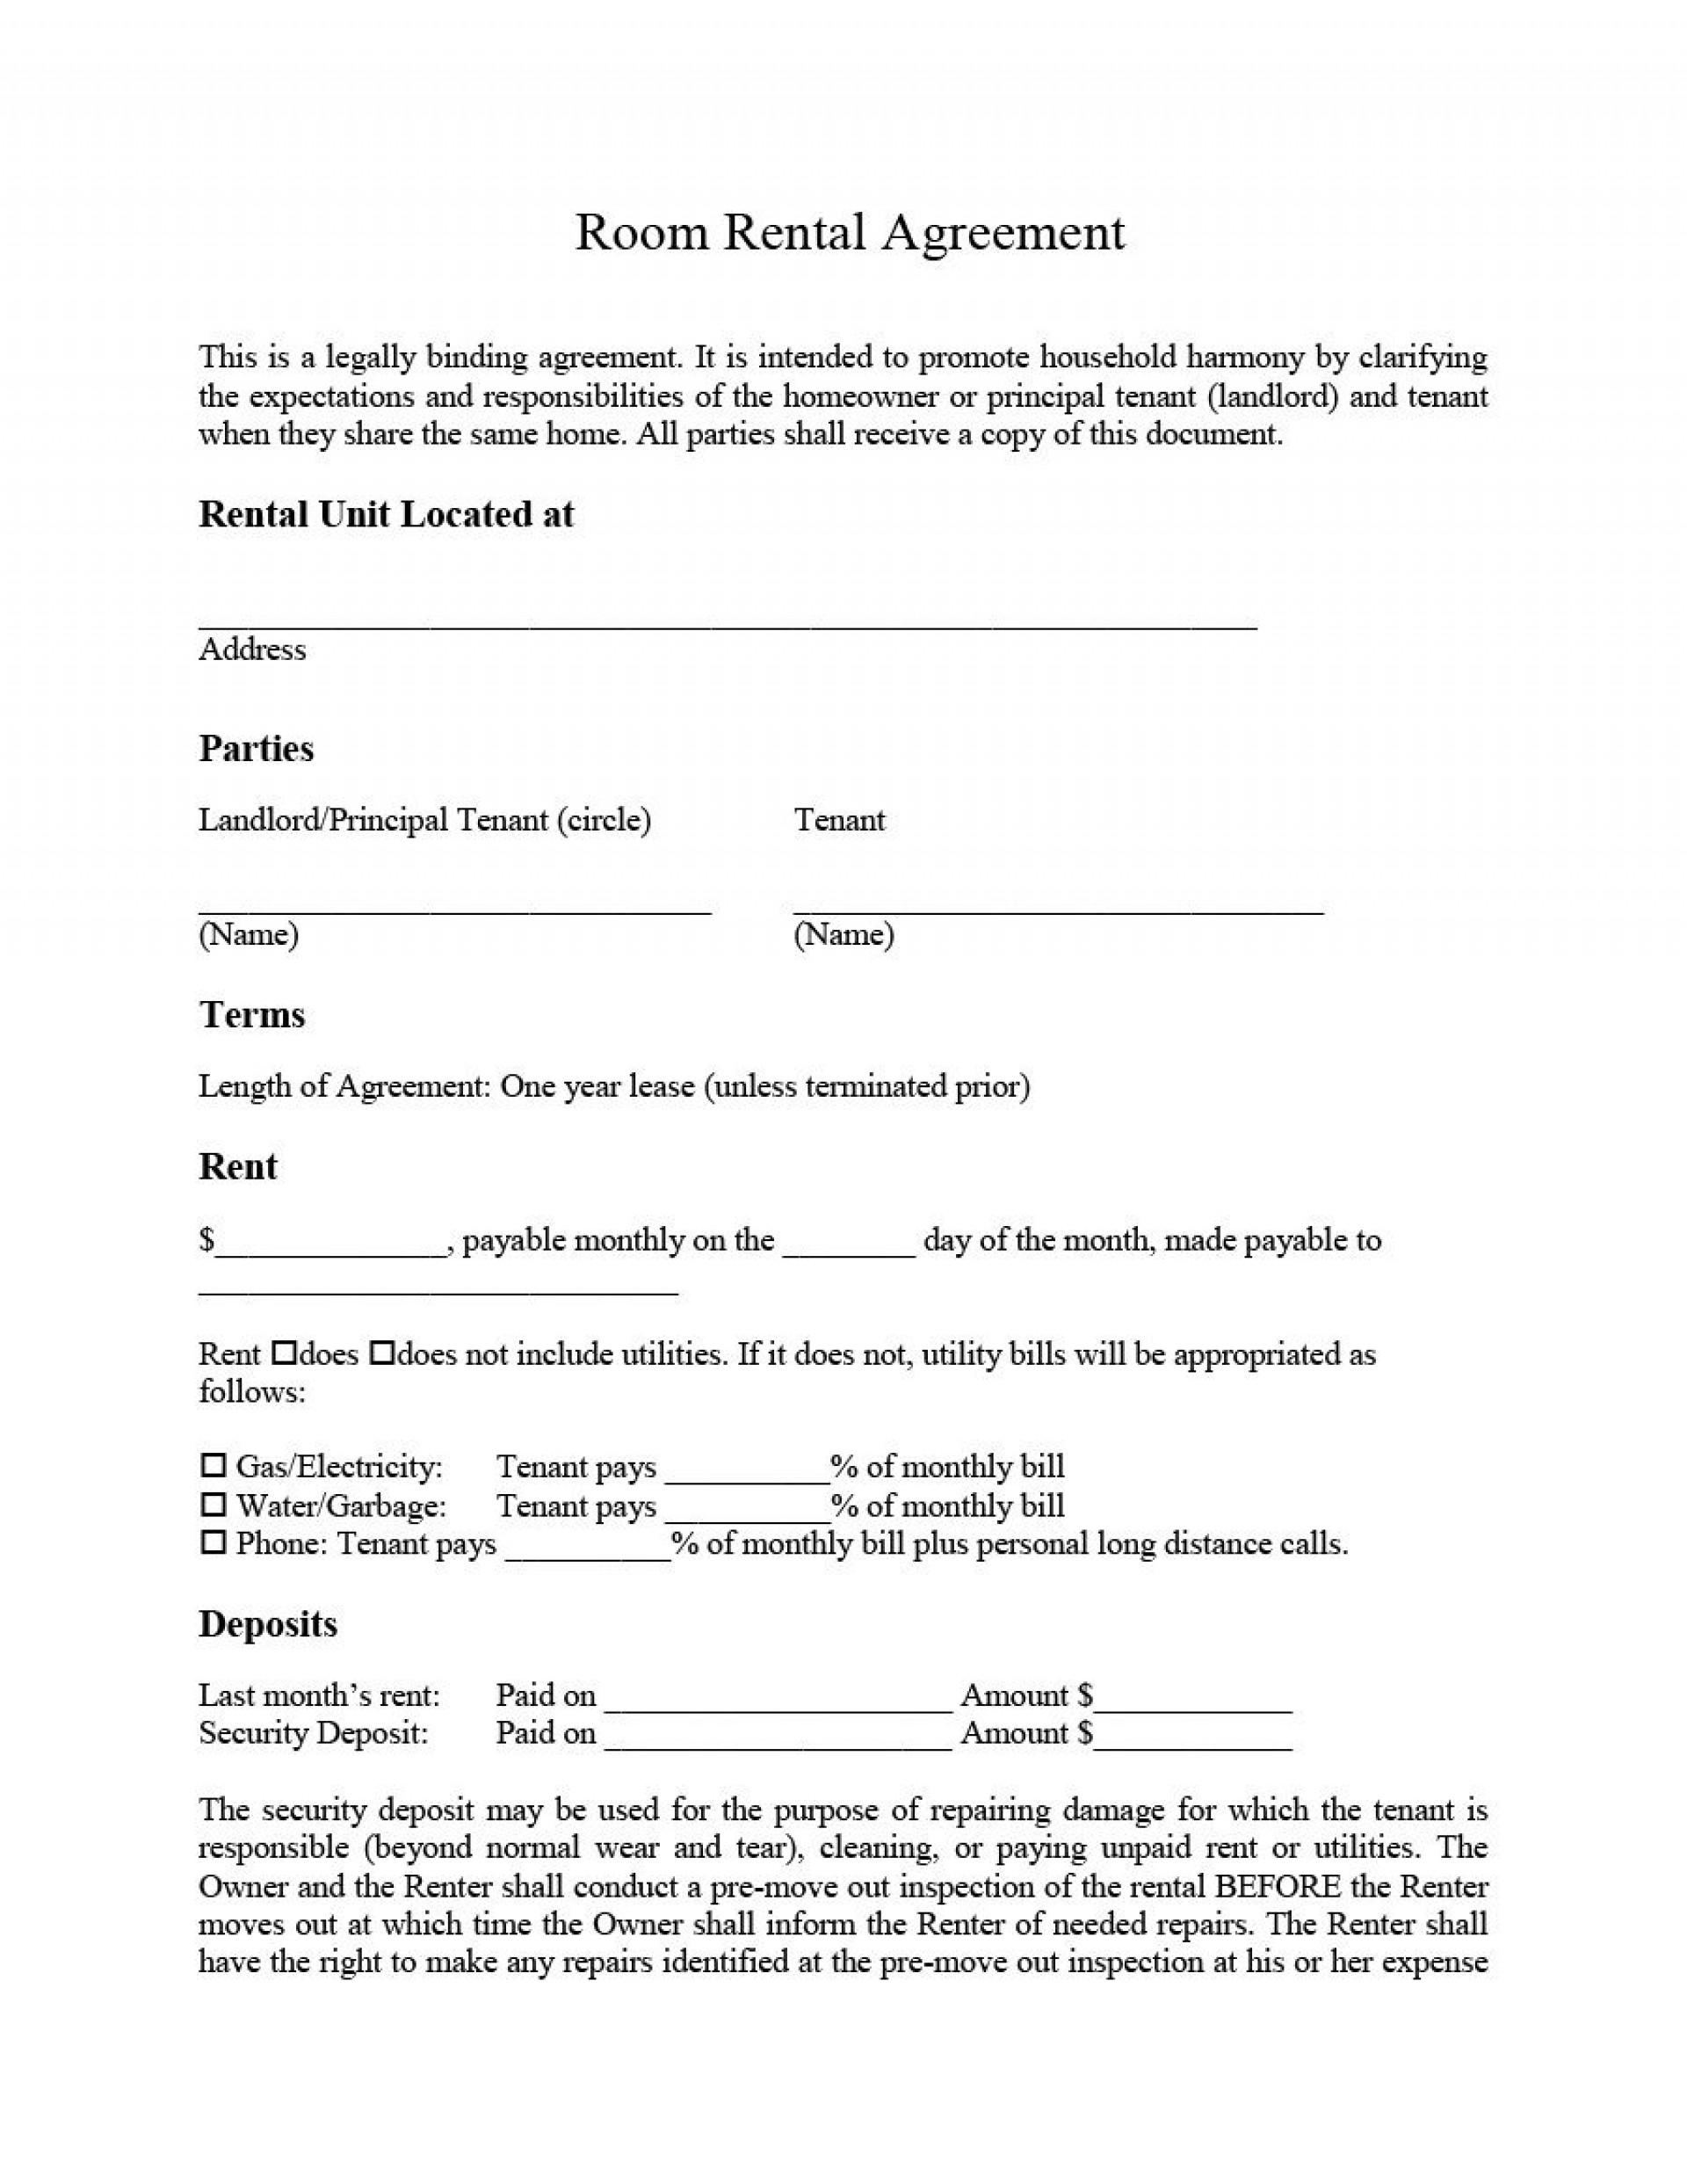 002 Beautiful Room Rental Agreement Template Word Doc Malaysia High Resolution 1920